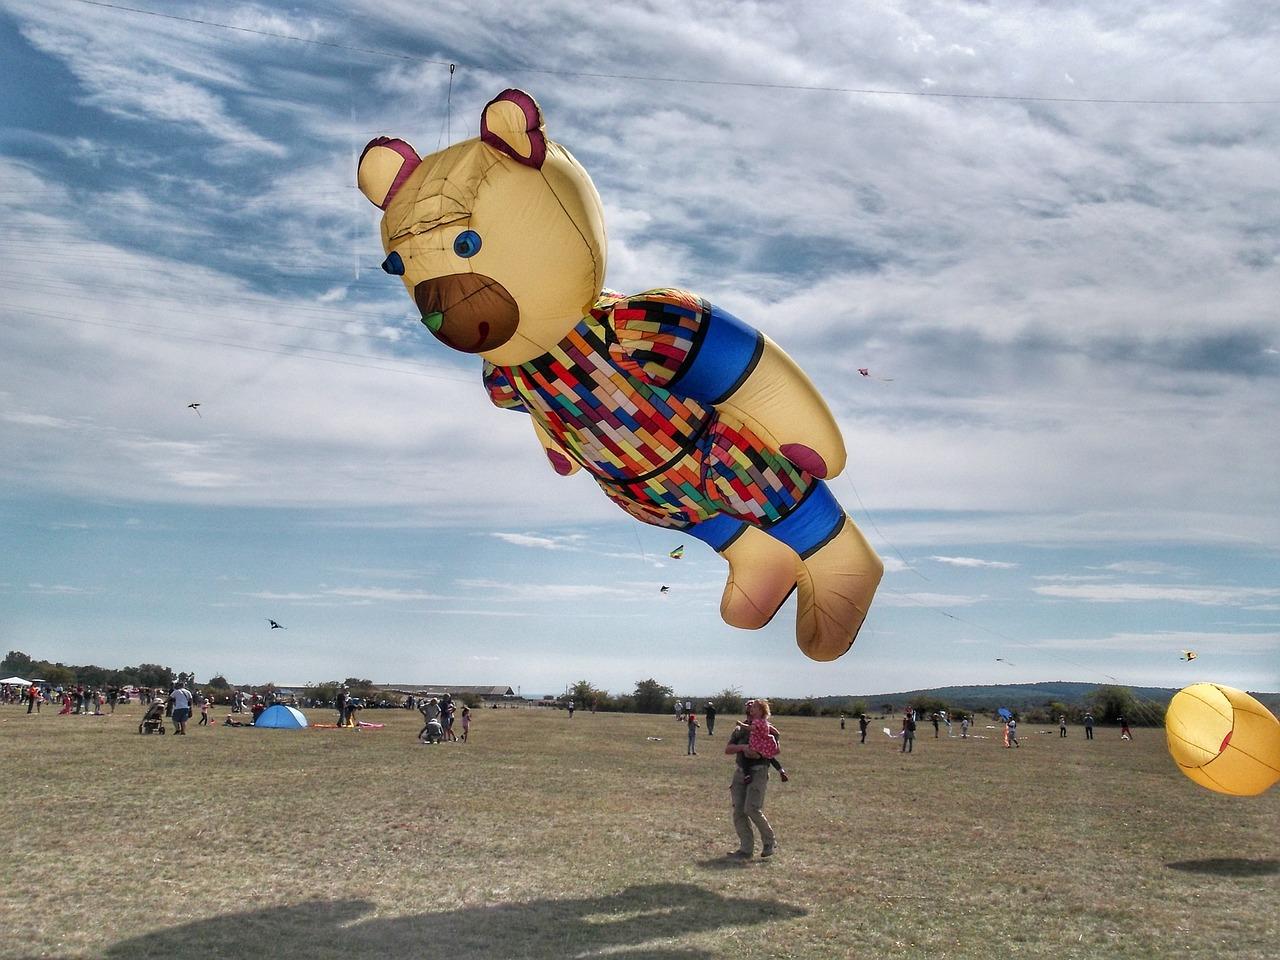 dragon-kite-flying-meadow-2708401.jpg